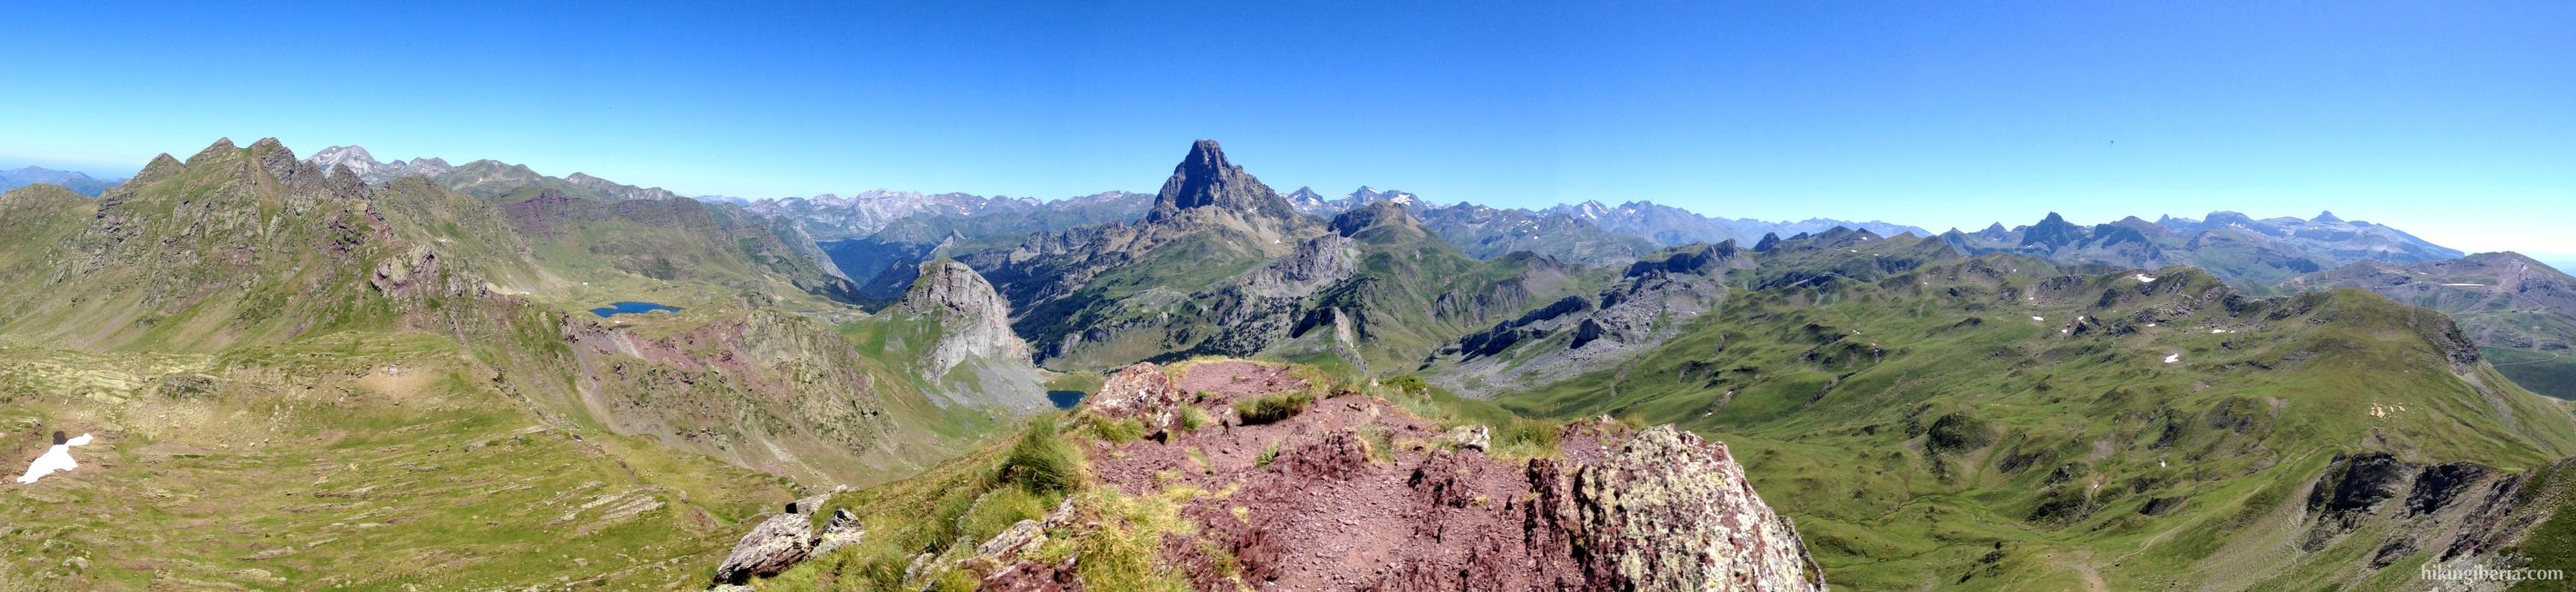 Pico de los Monjes